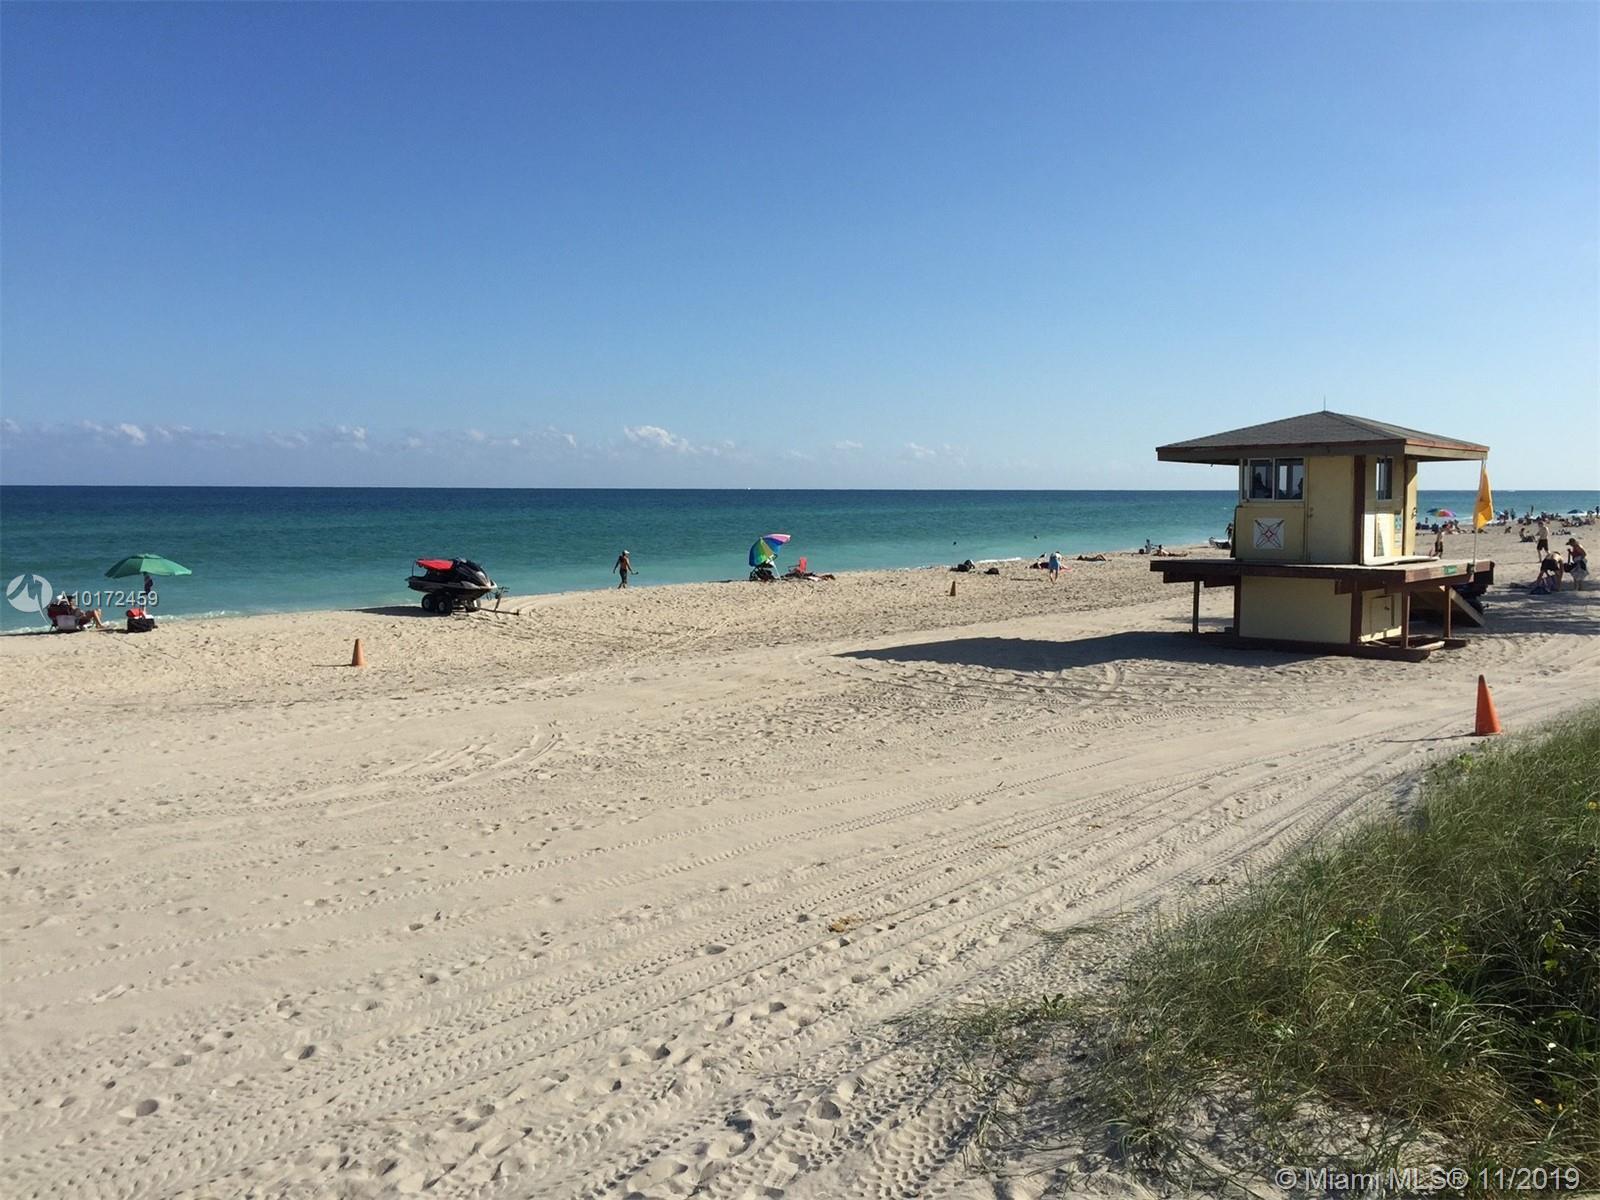 101 N Ocean Dr # 231, Hollywood, Florida 33019, ,1 BathroomBathrooms,Residential,For Sale,101 N Ocean Dr # 231,A10172459